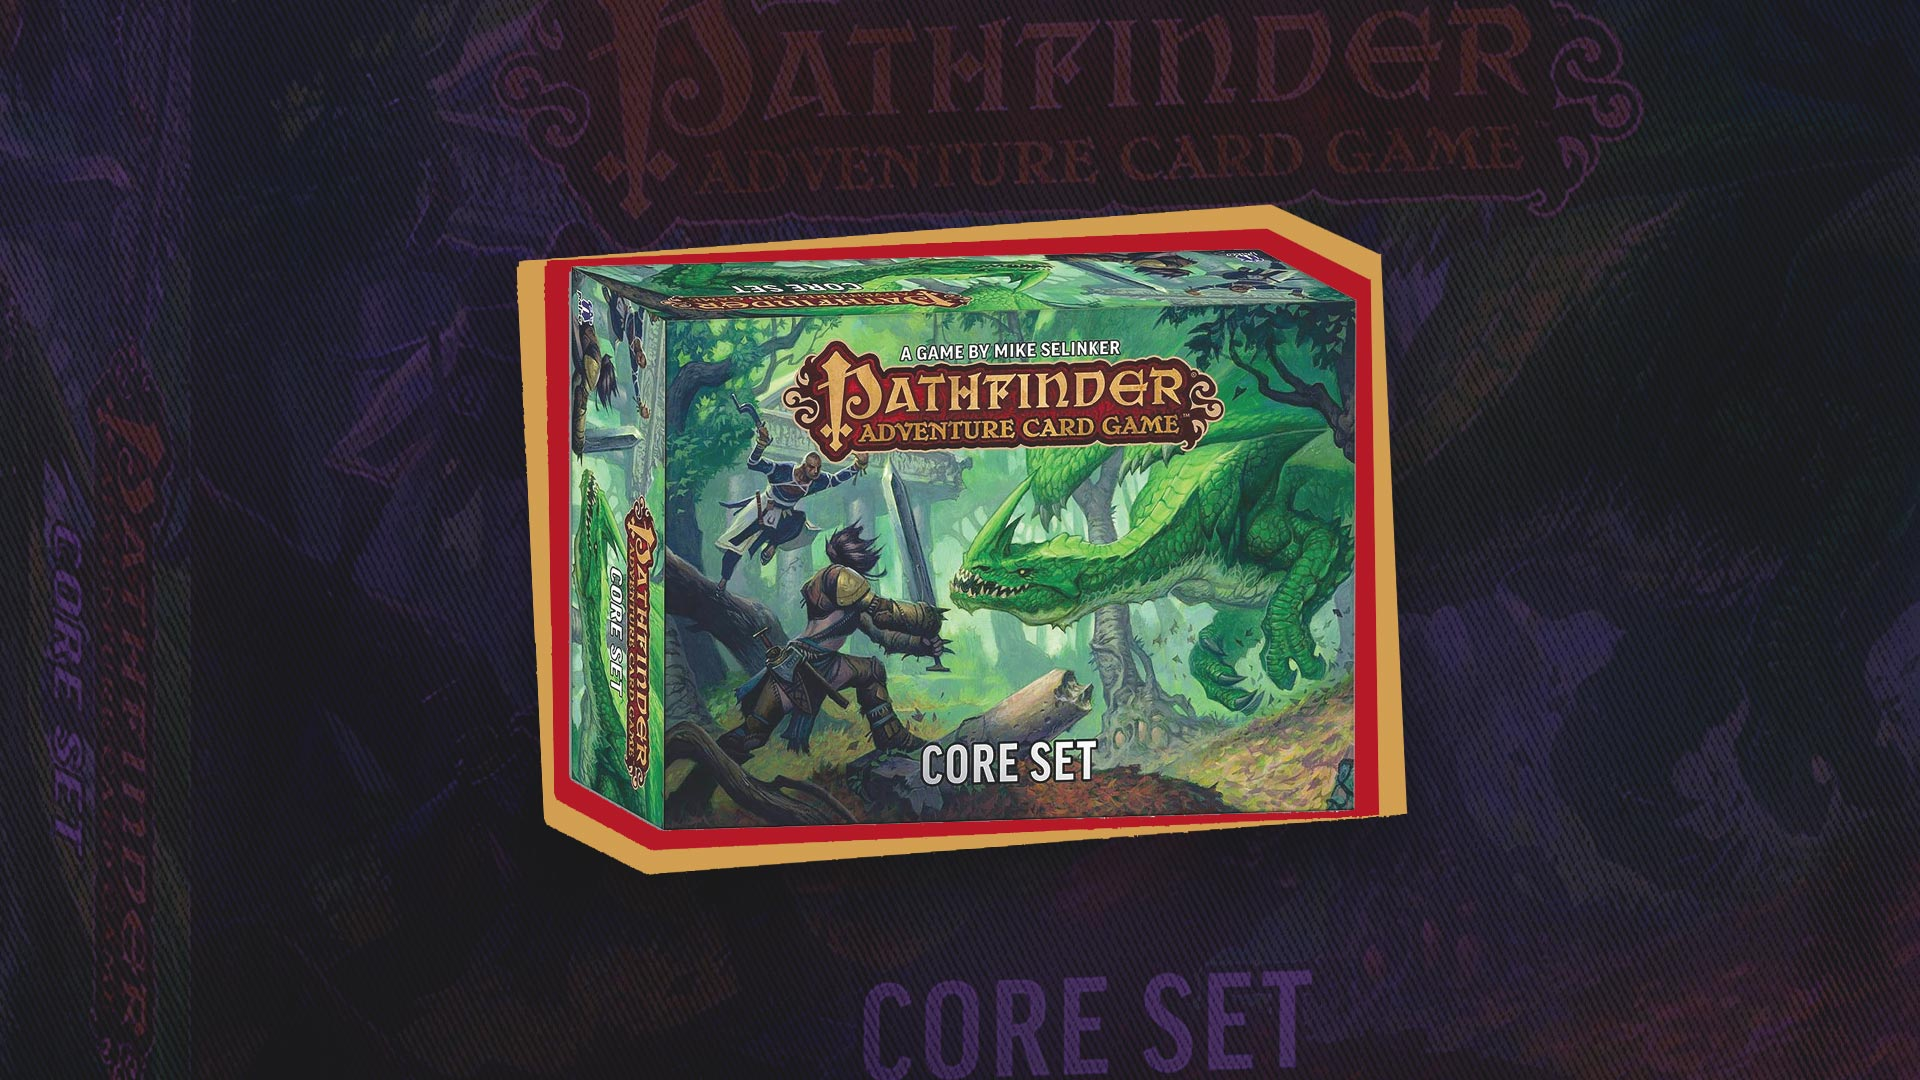 Pathfinder Adventure Card Game Core Set: A SuperParent